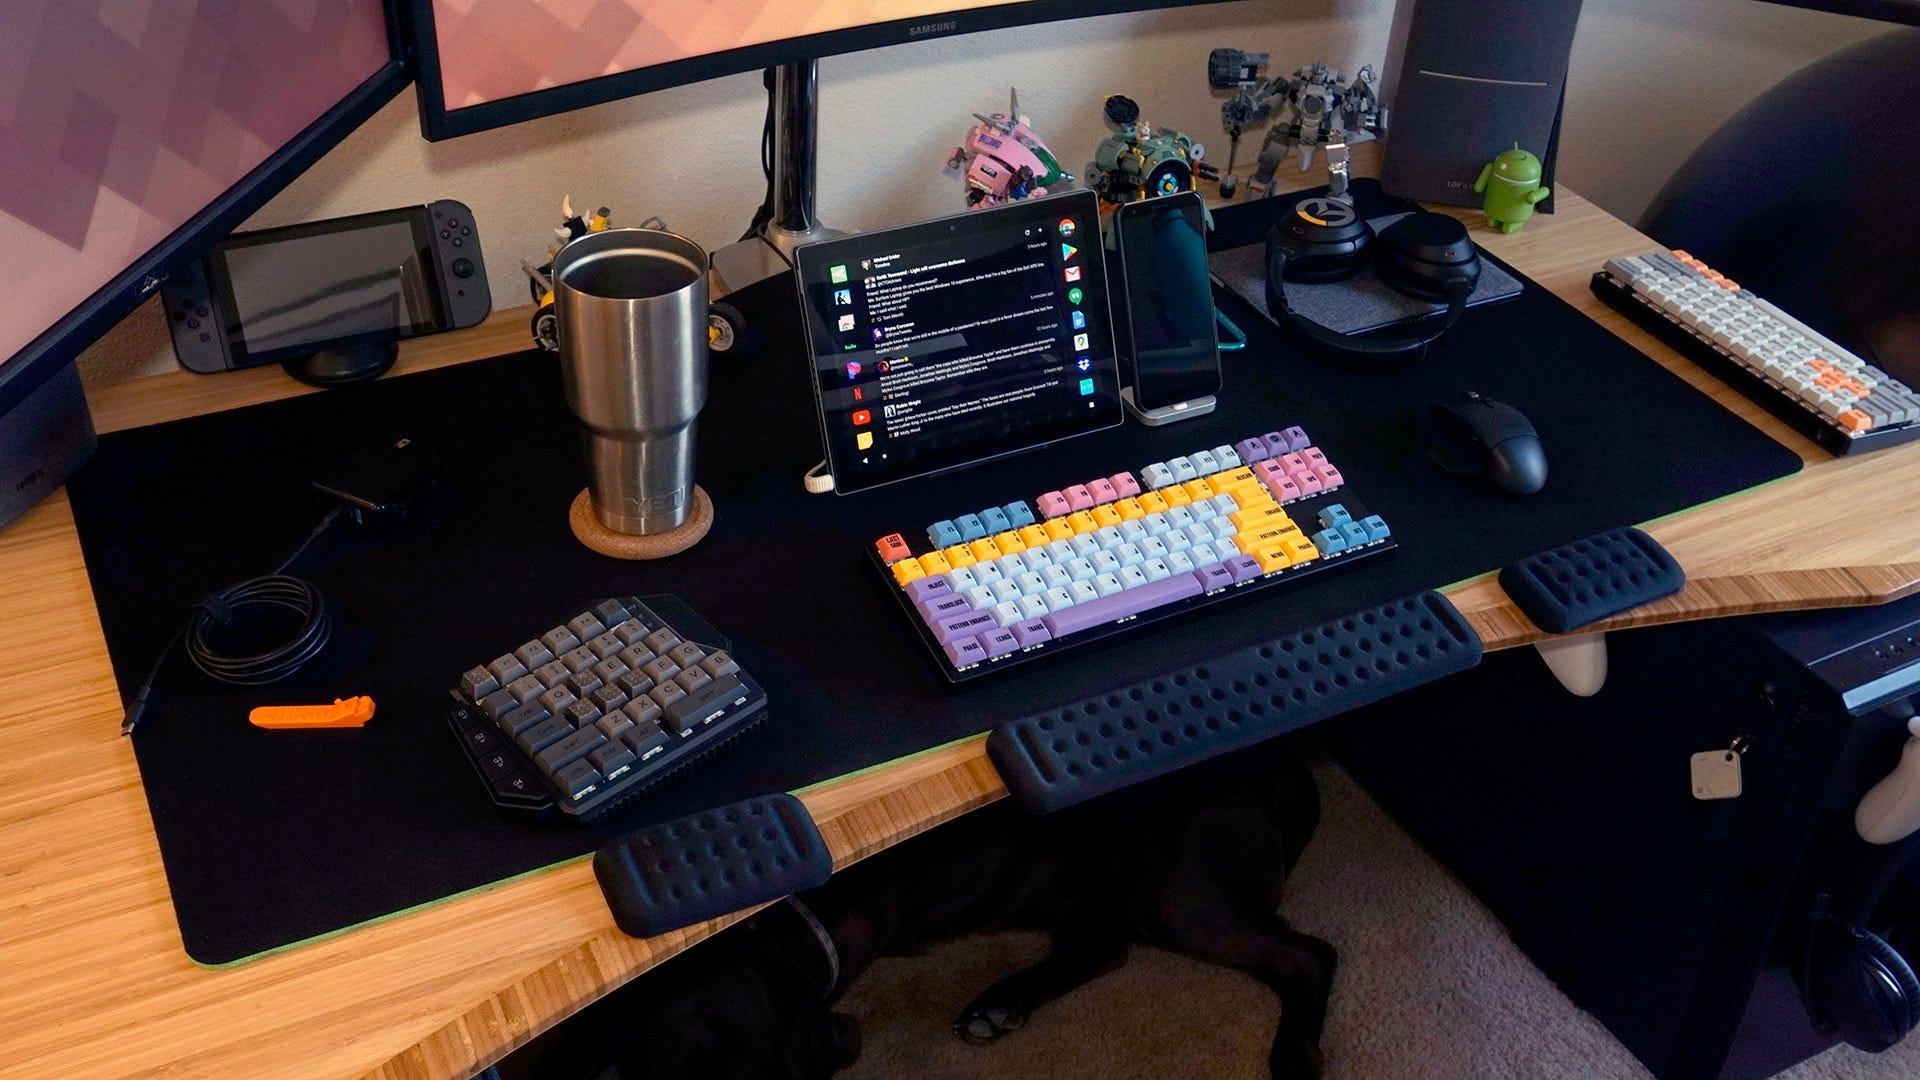 Gigantus V2 loaded down with desk items.